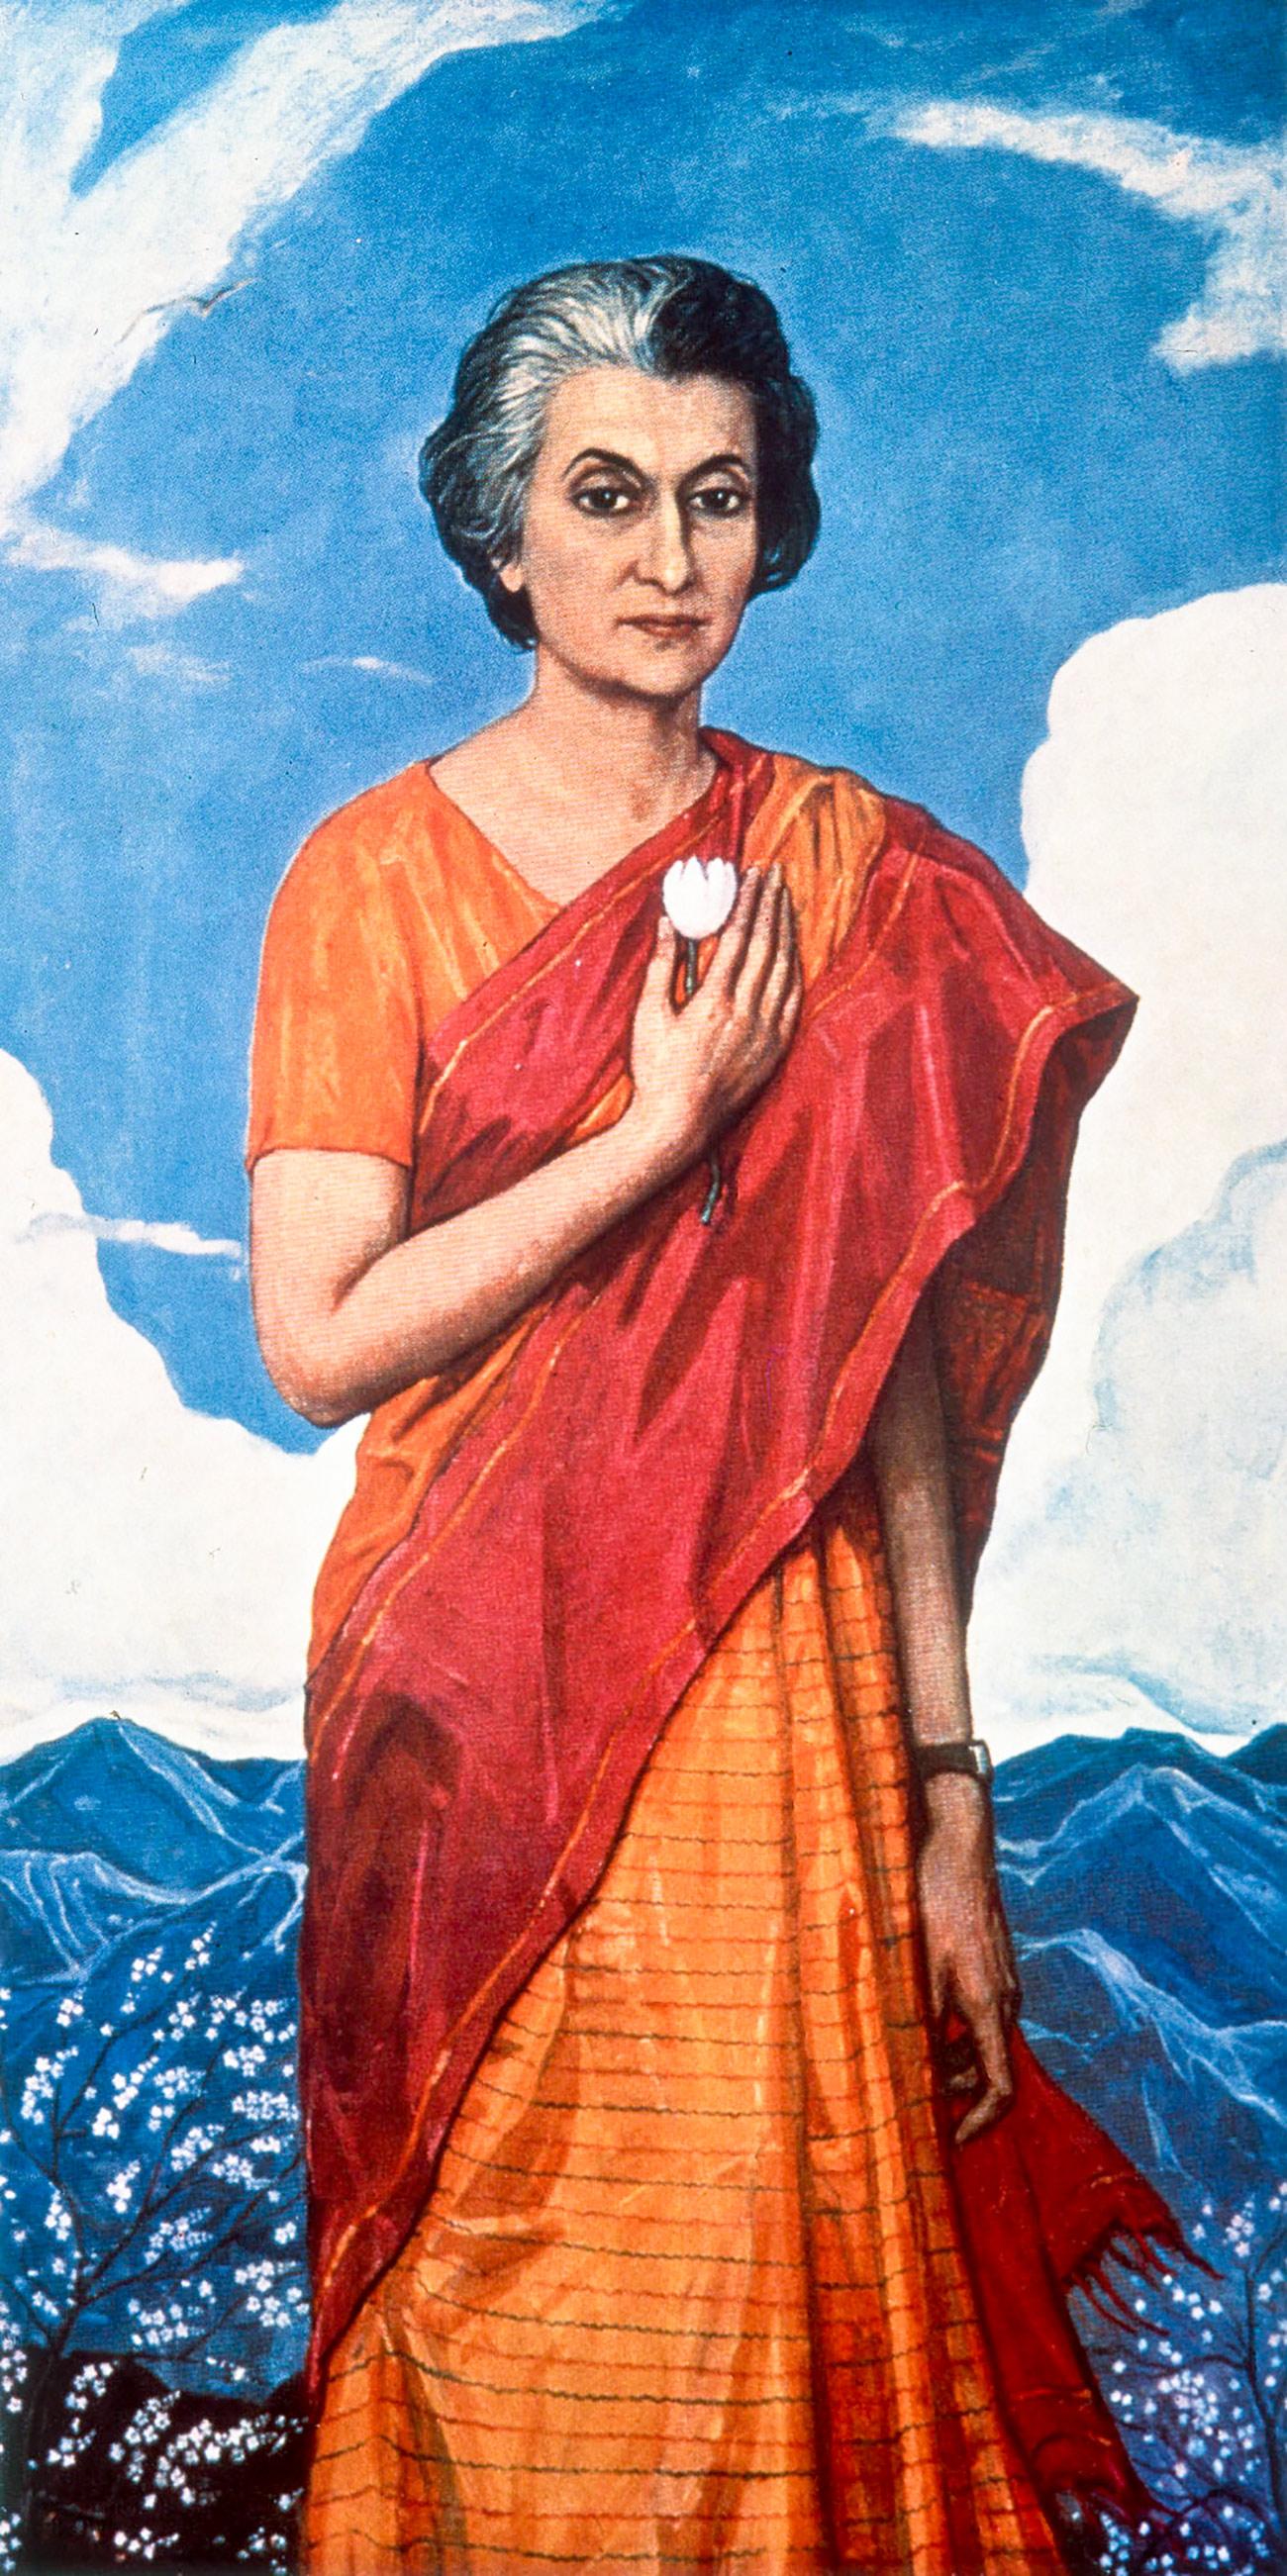 … to Indian Prime Minister Indira Gandhi.